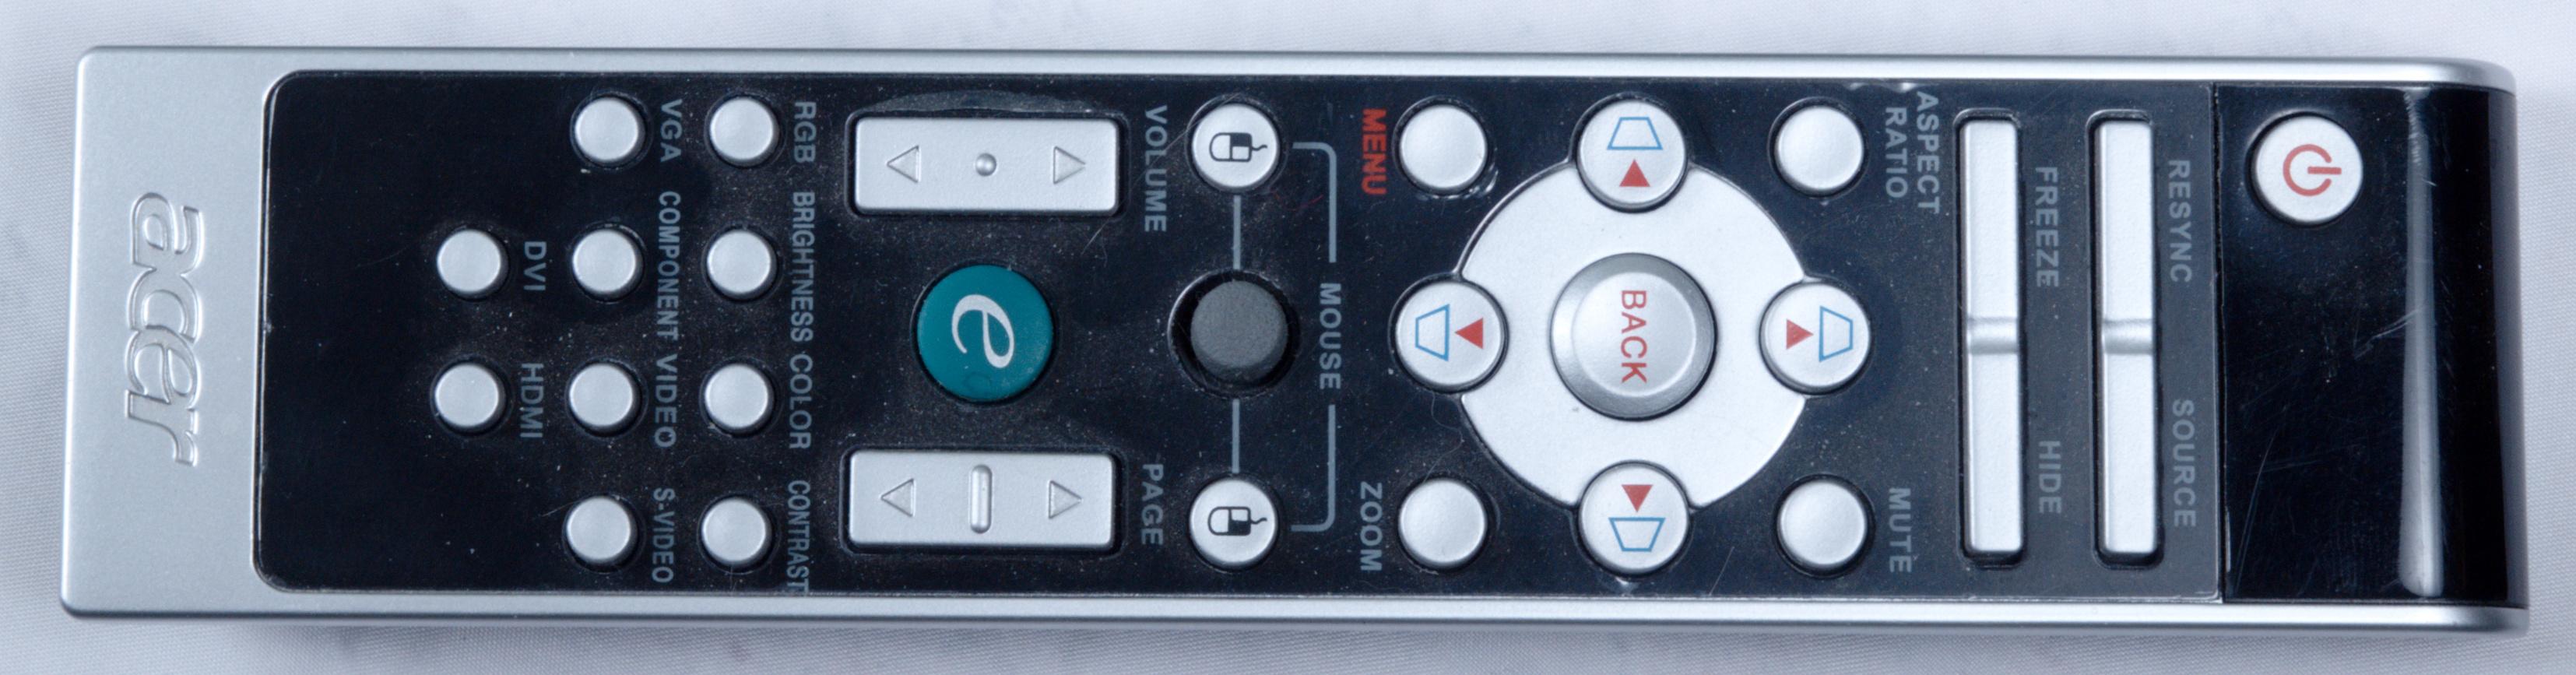 projector-control.jpeg